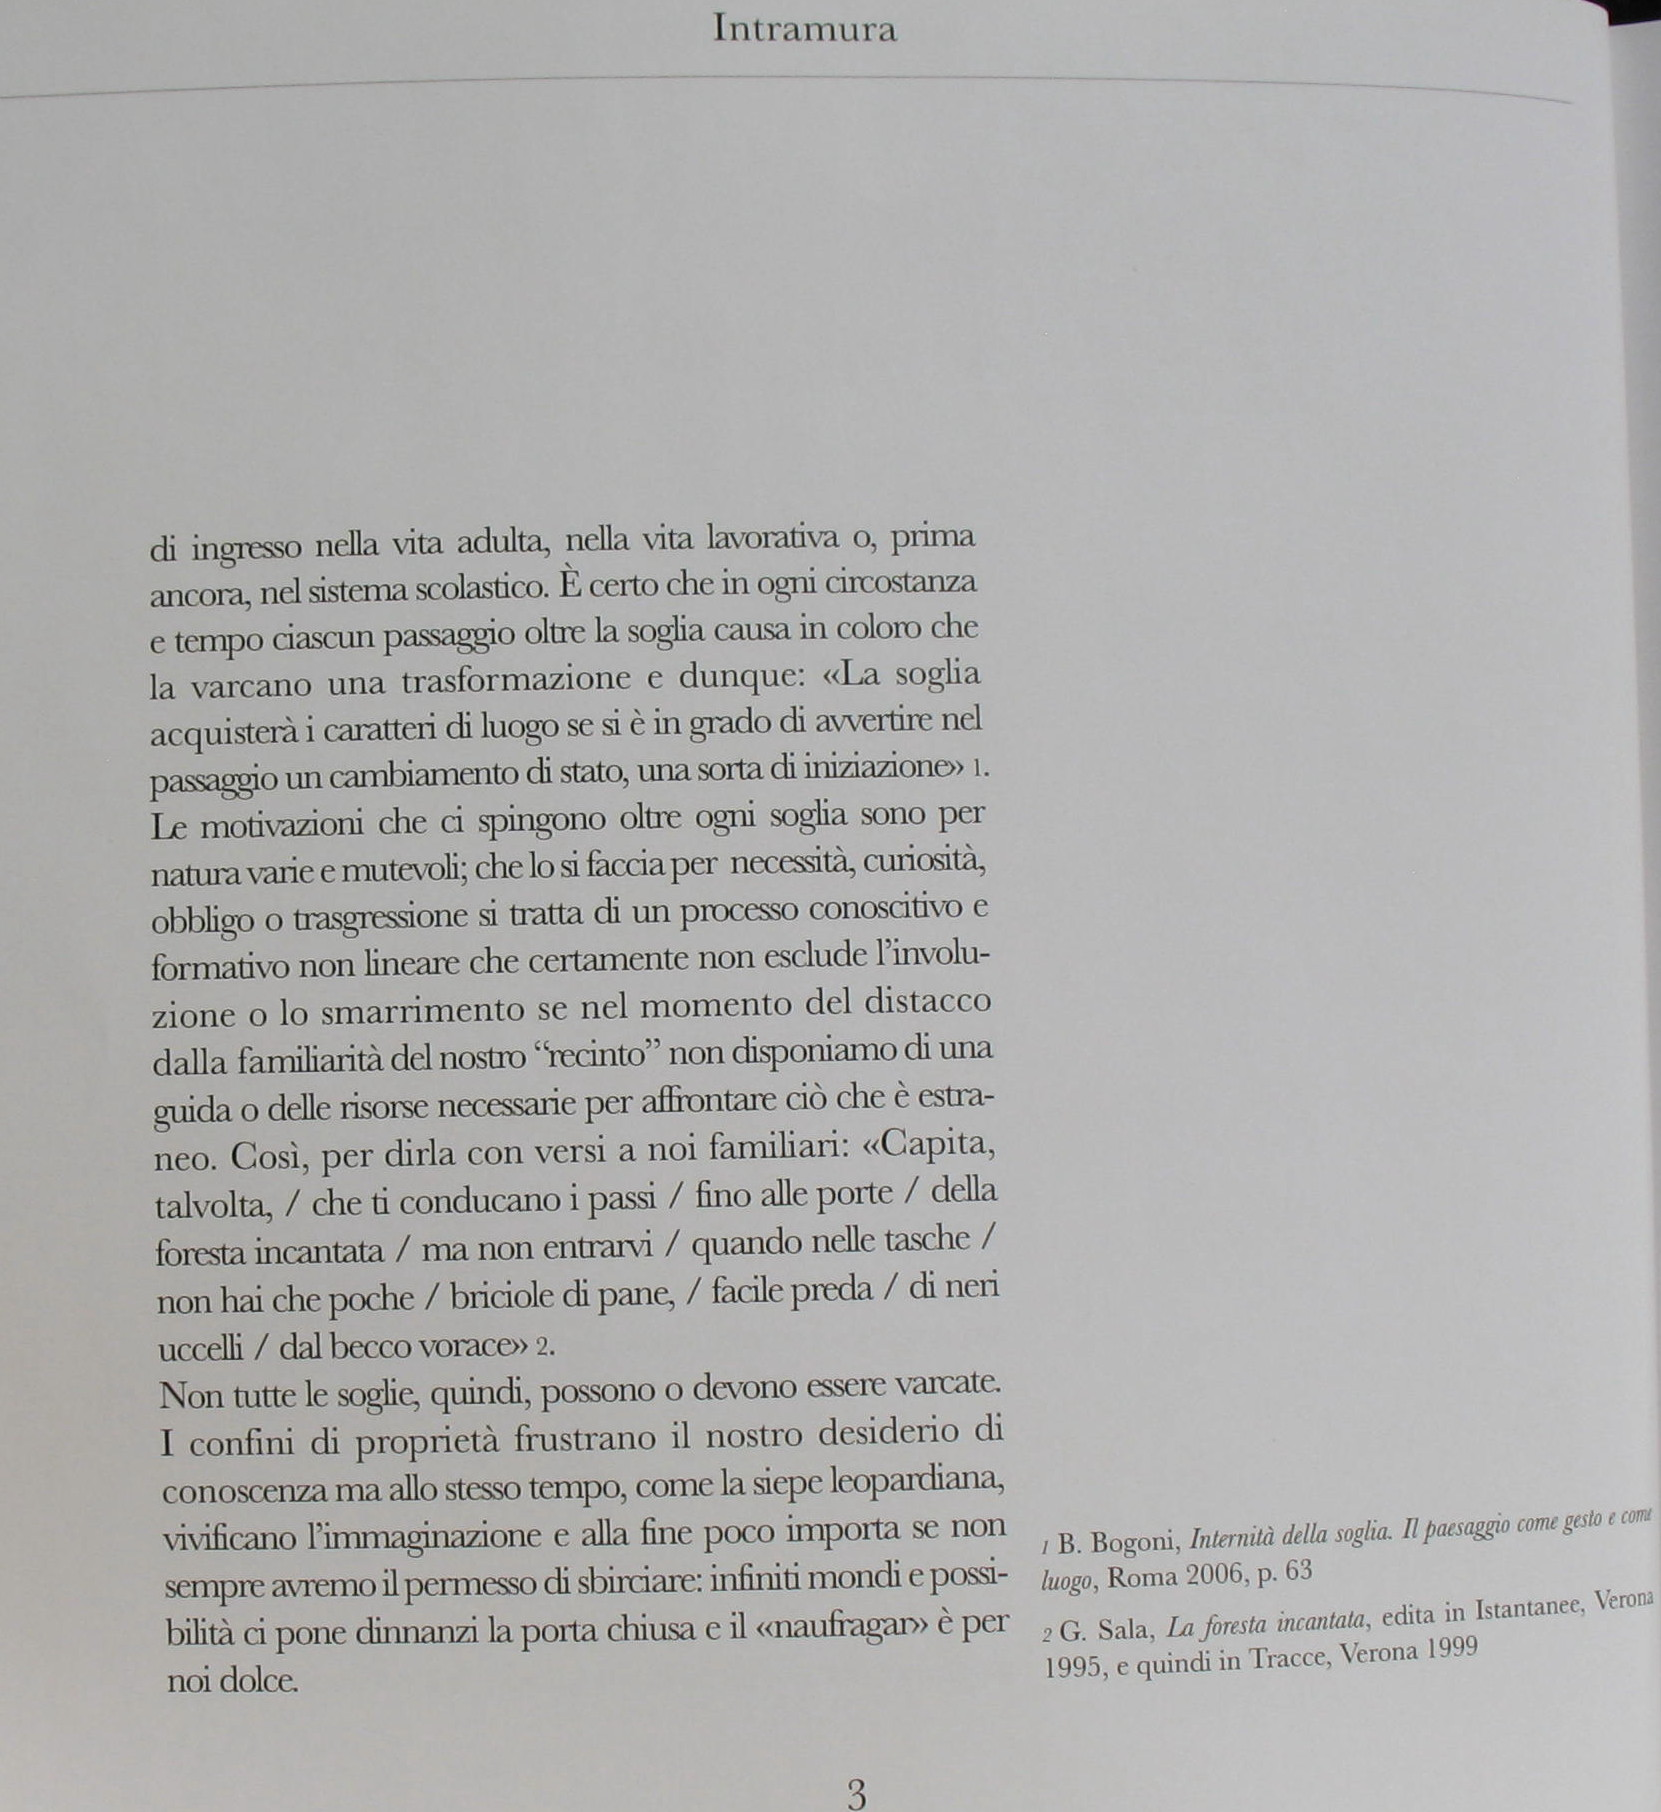 Intramura 03